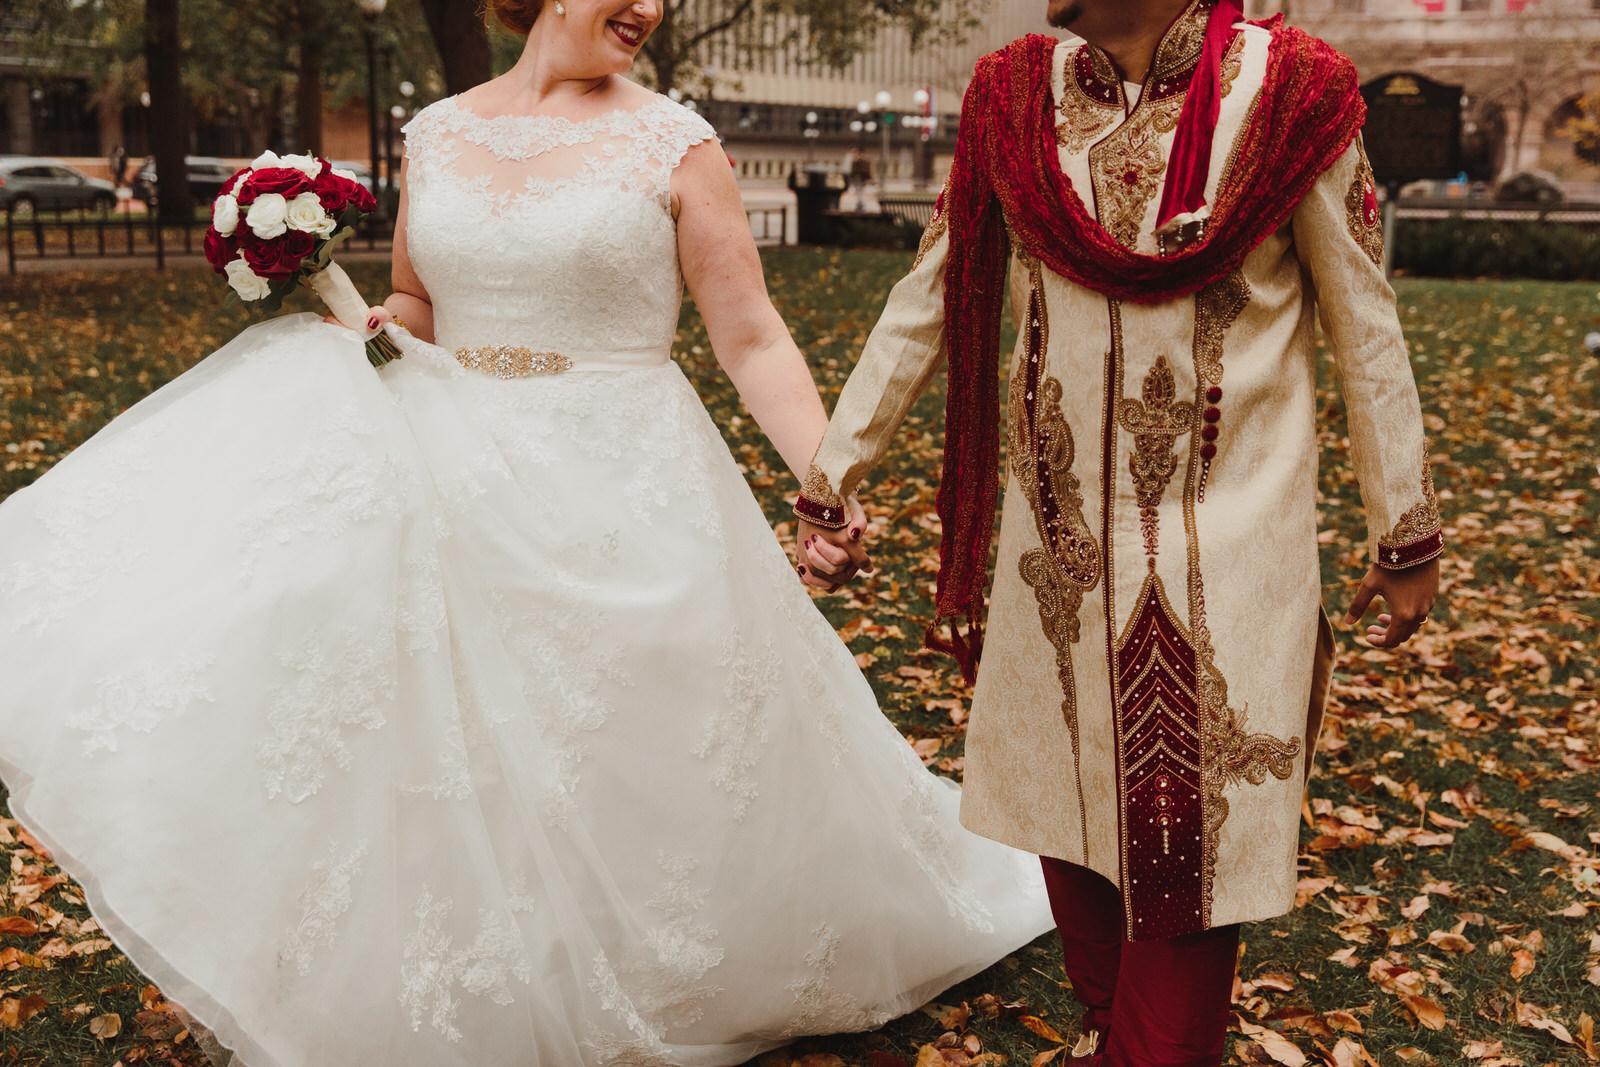 bride and groom walking around before their wedding